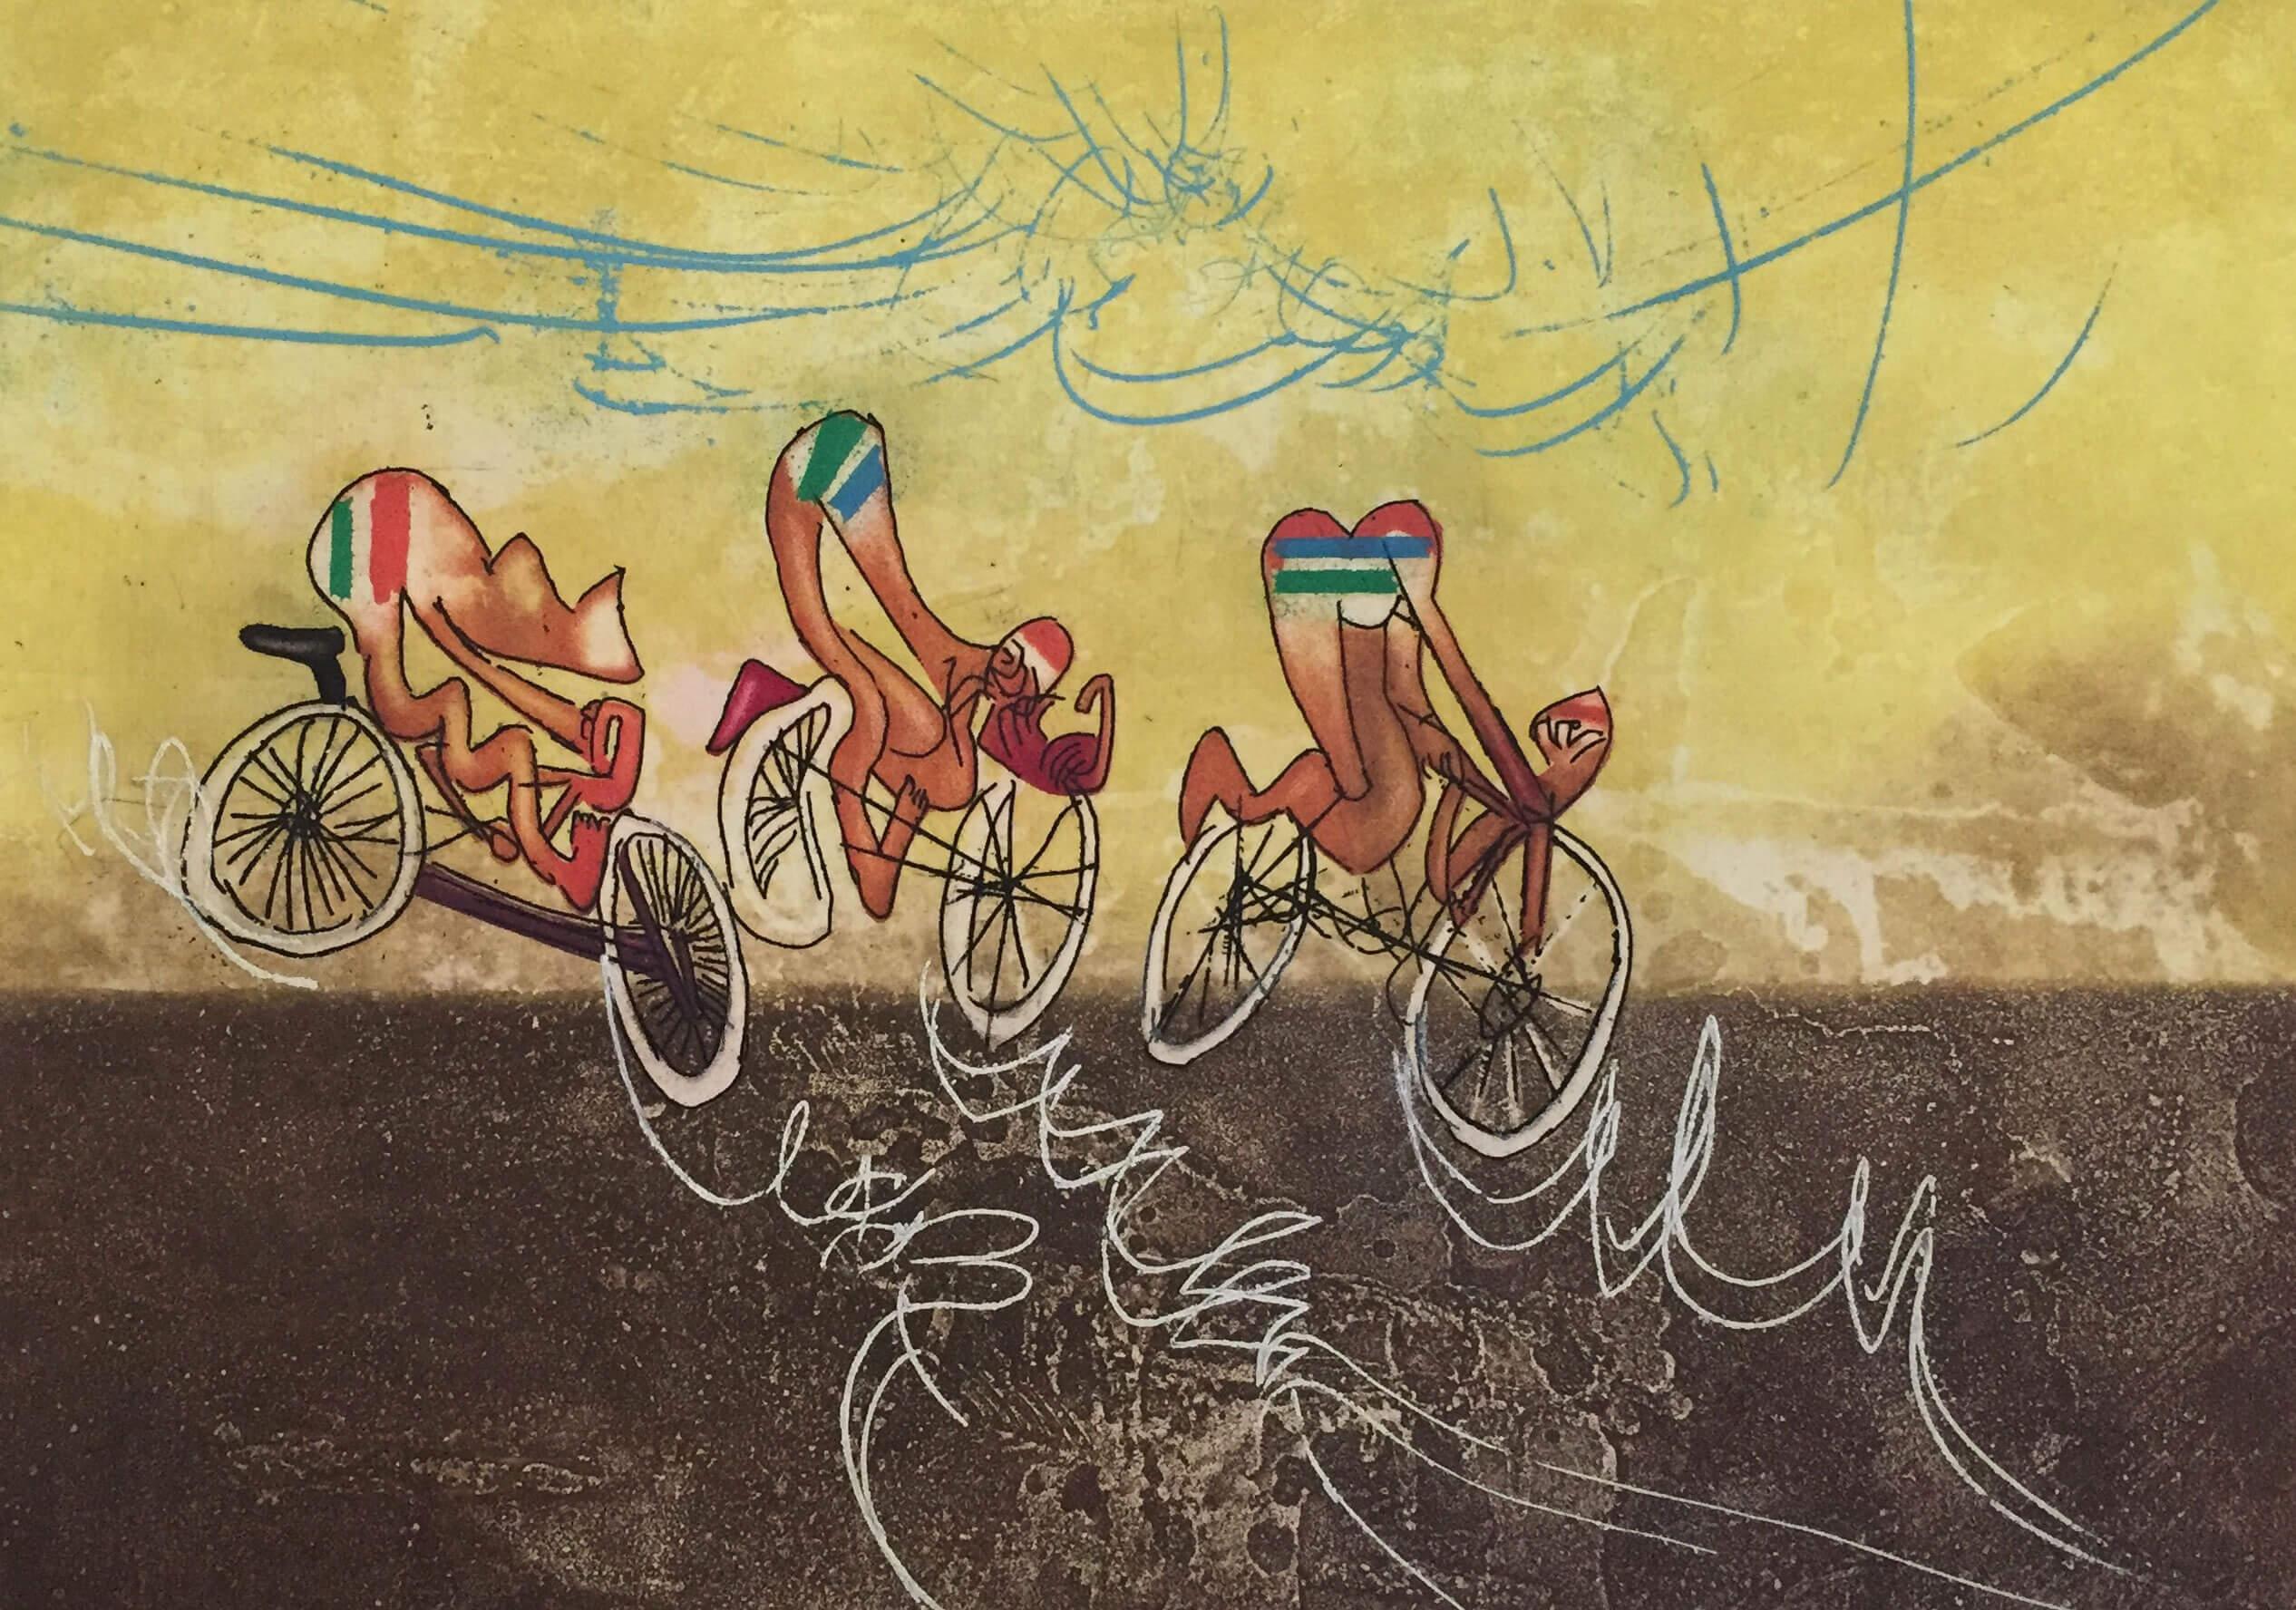 LES CYCLISTES - LES TRANSESPORTS - Roberto Matta